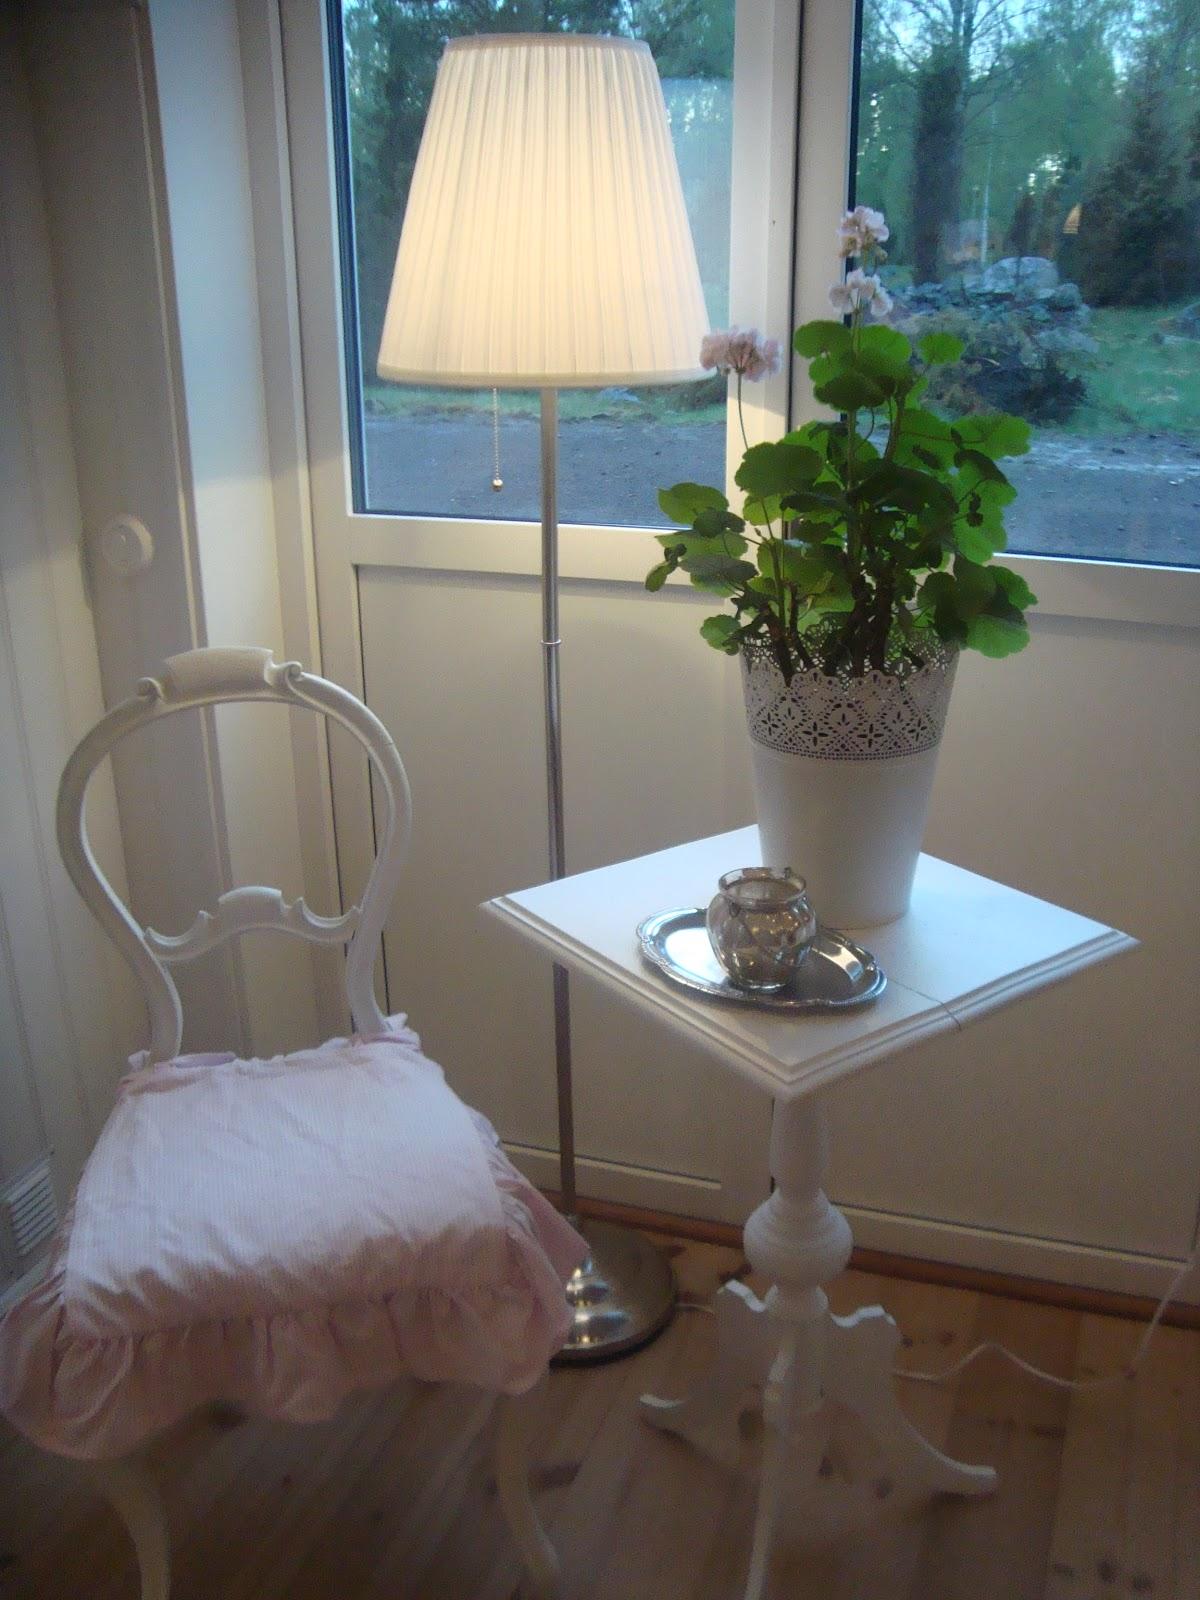 Gammaldags Kok Ikea : gammaldags kok ikea  Vid utgongen till altanen stor en stol, ett